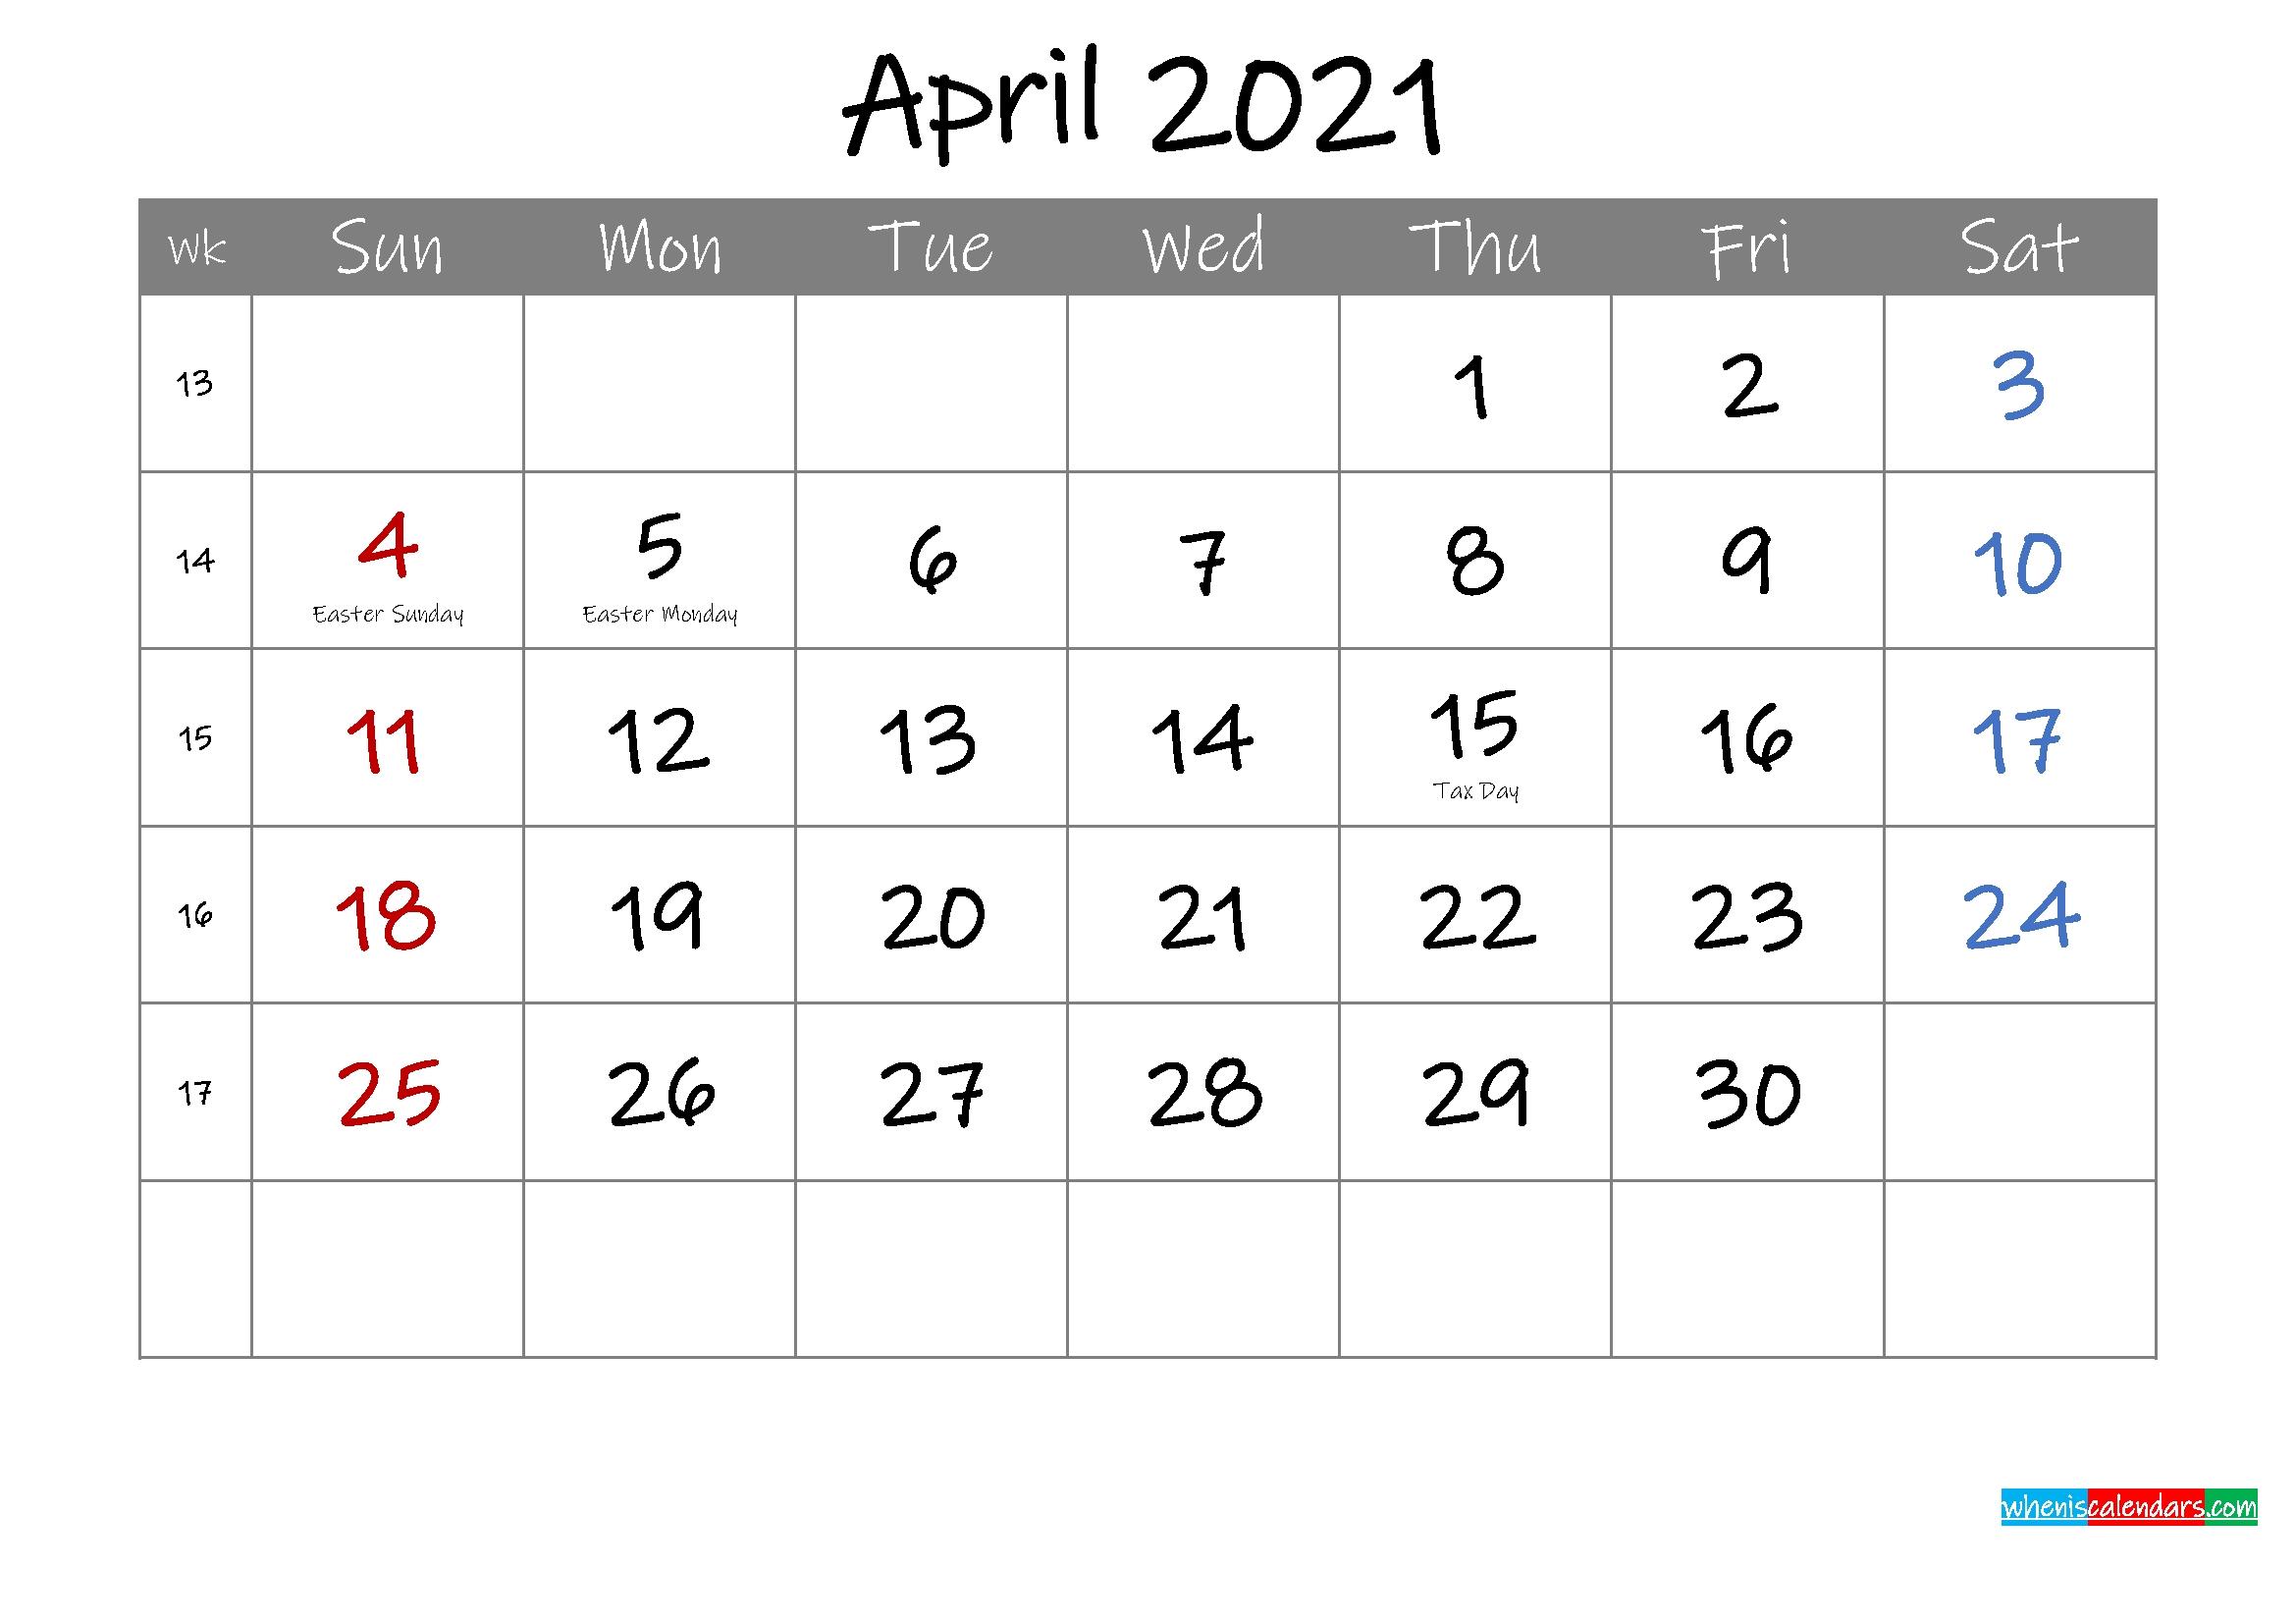 Editable April 2021 Calendar With Holidays - Template Ink21M4   Free Printable 2020 Calendar Calendar November 2020 To April 2021